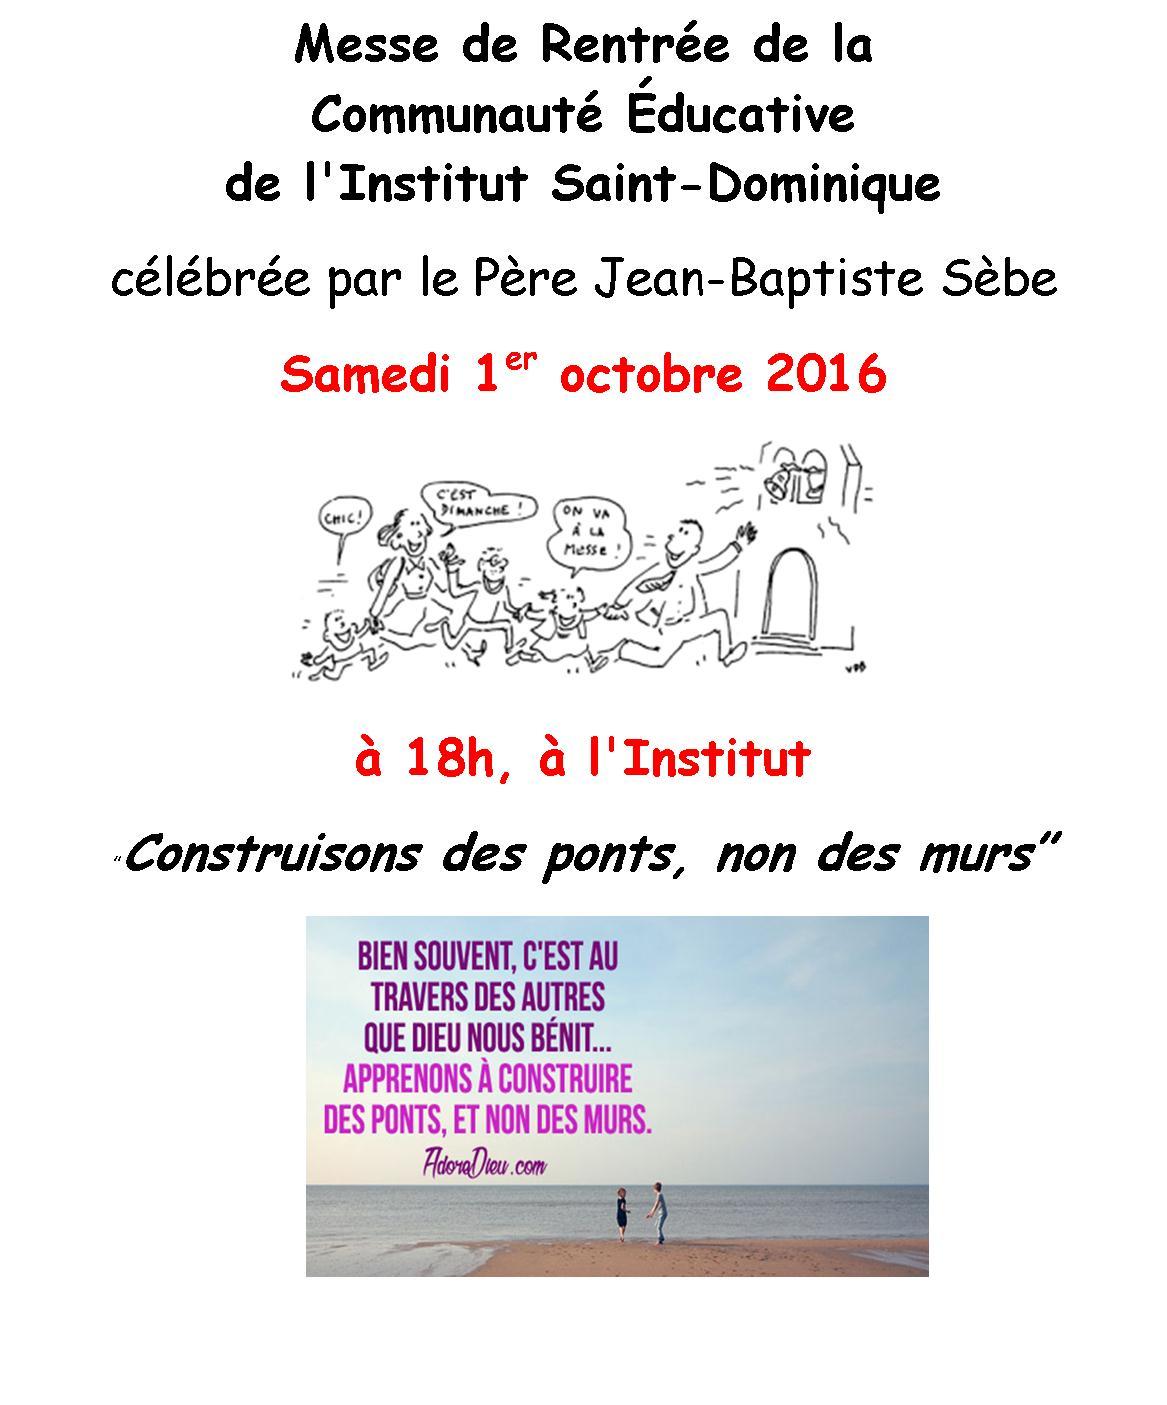 messe-de-rentree-1er-octobre-2016